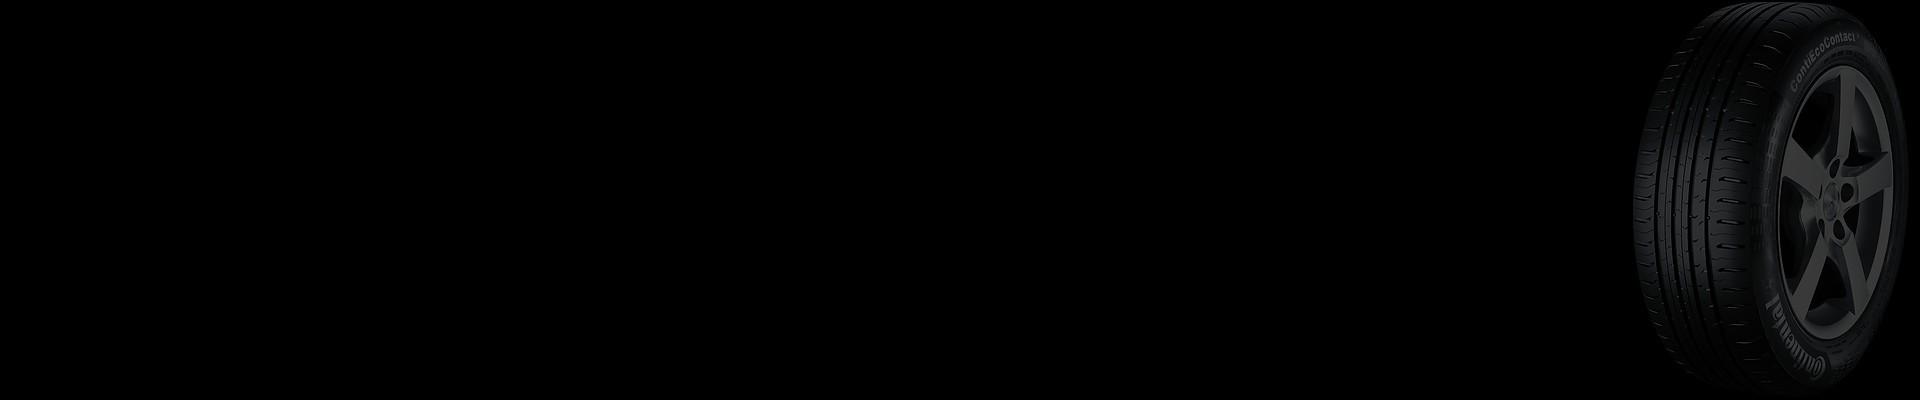 banner image 2